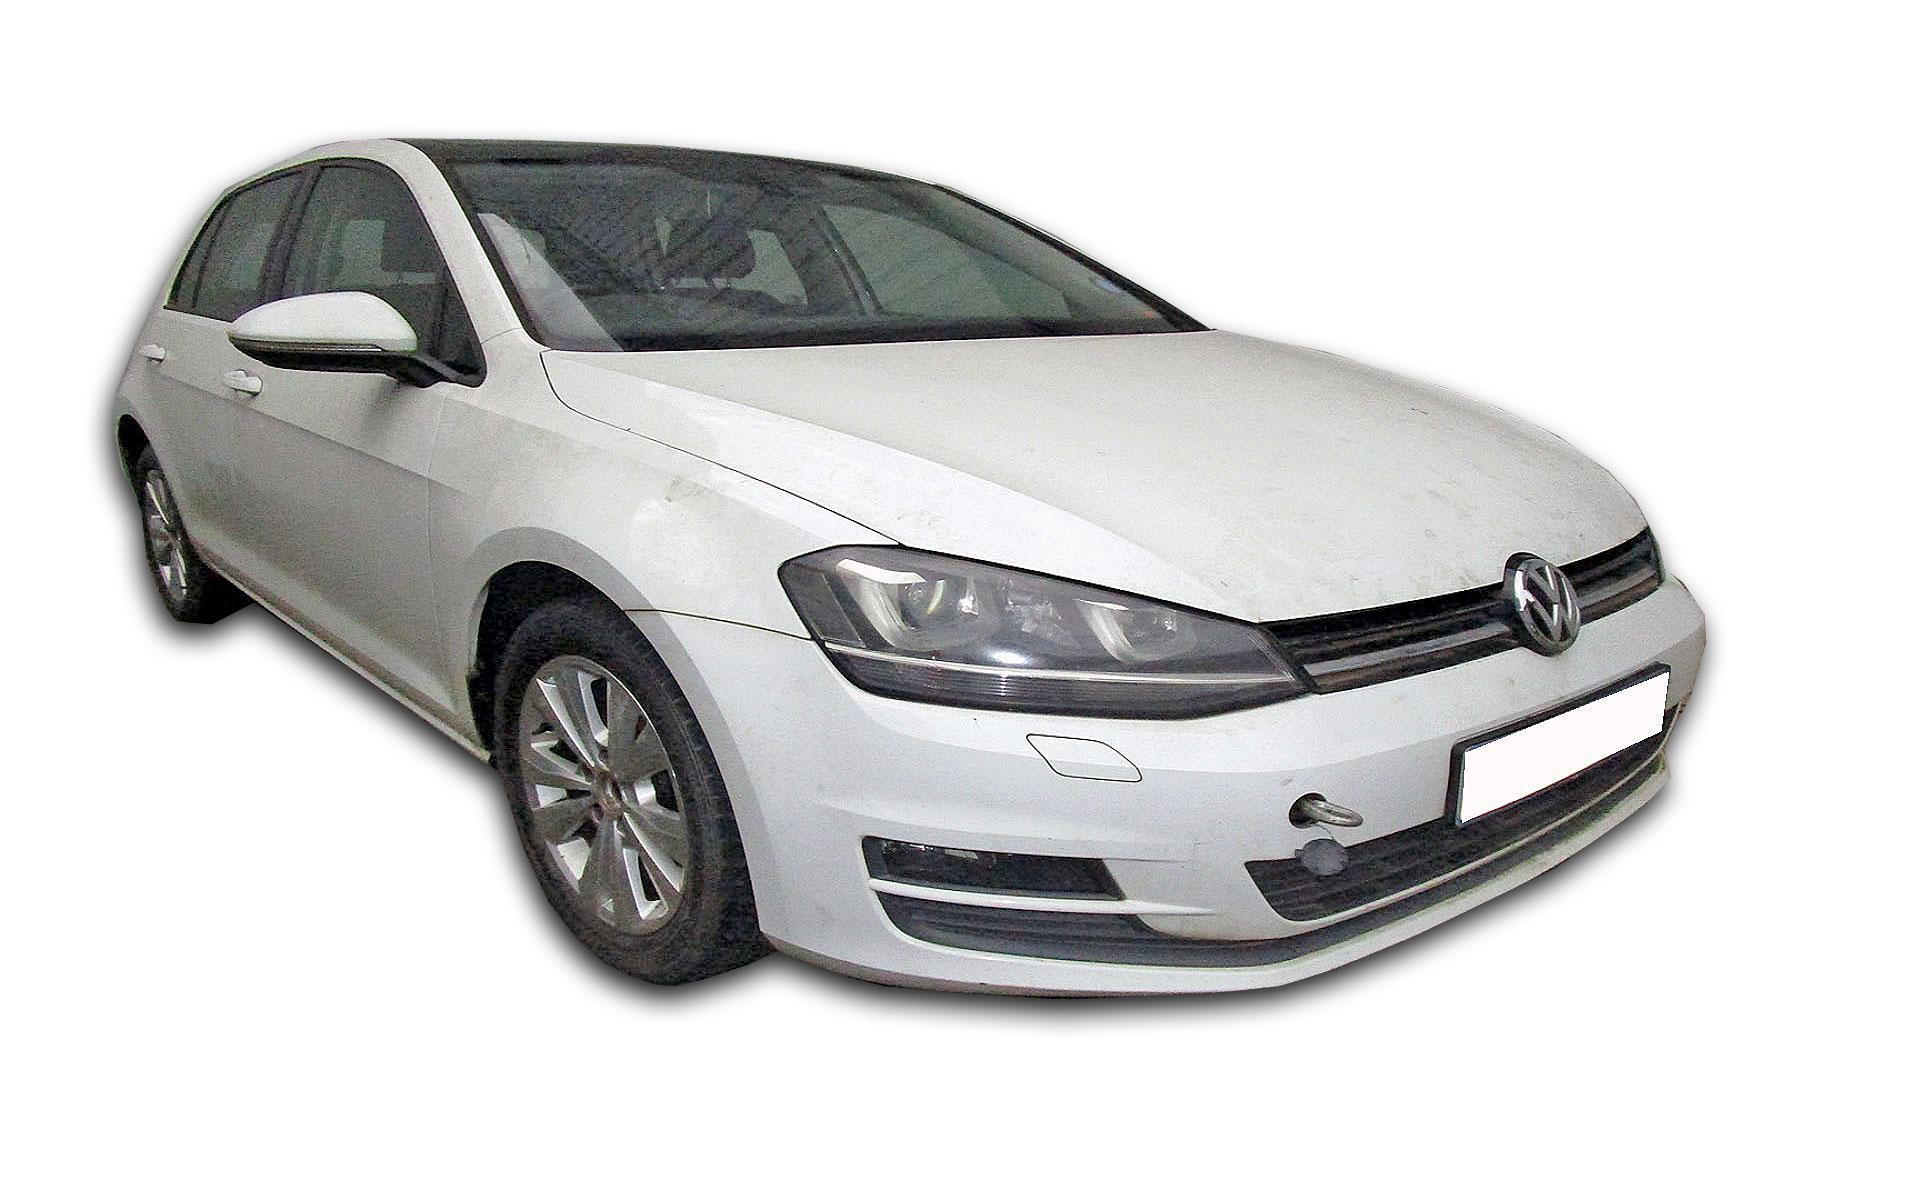 VW Golf 7 1.4 Tsi Comfortline